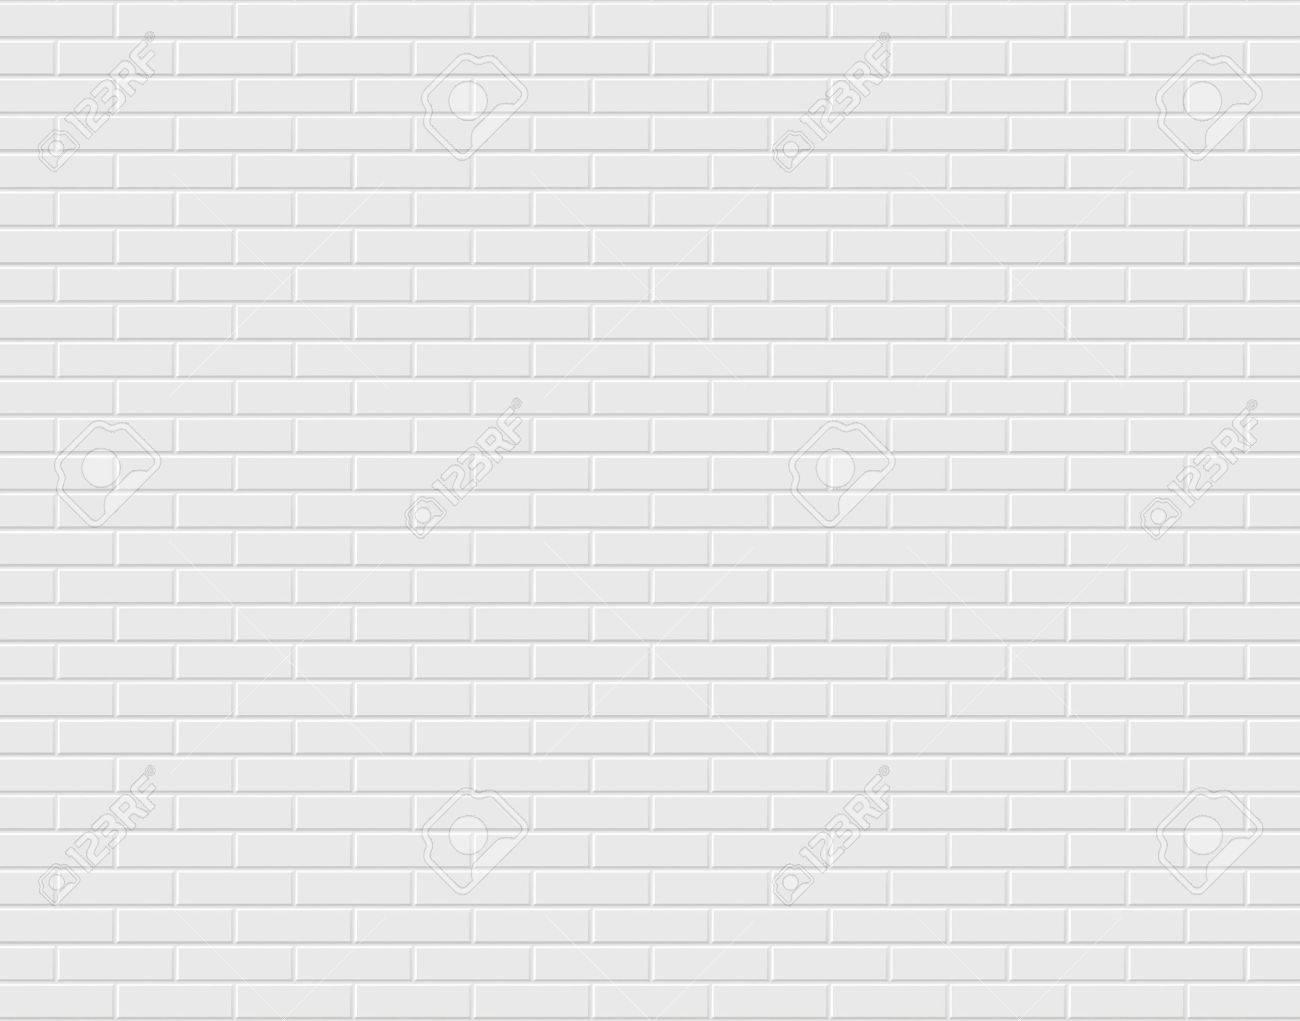 White brick wall. - 60913362